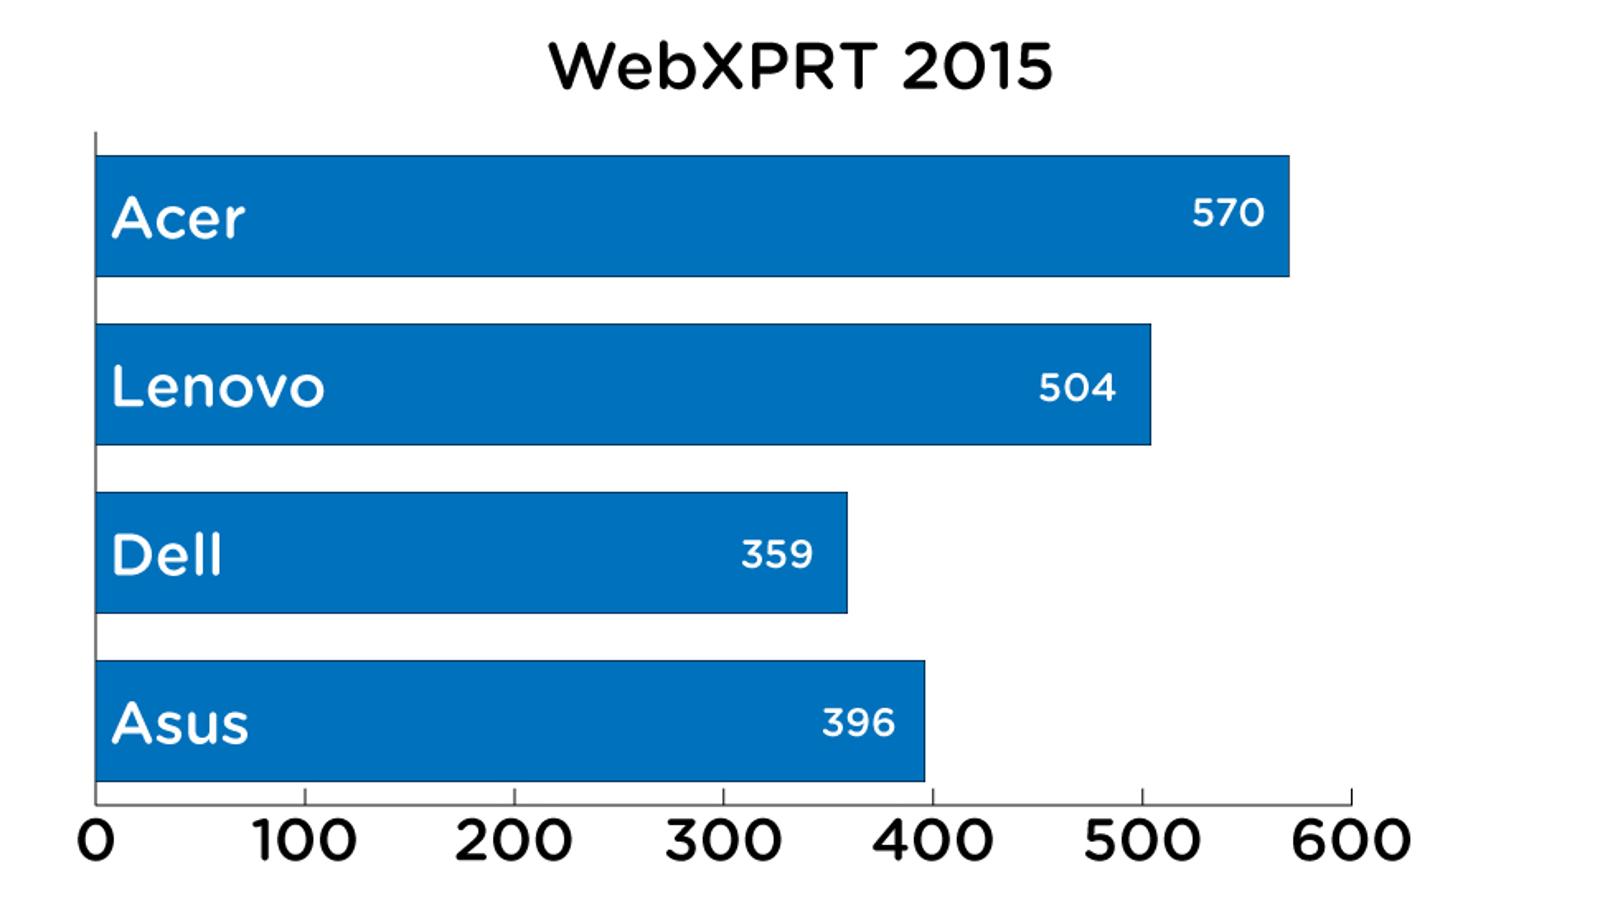 WebXPRT 2015 Score. Higher is better. Image: Alex Cranz/Gizmodo